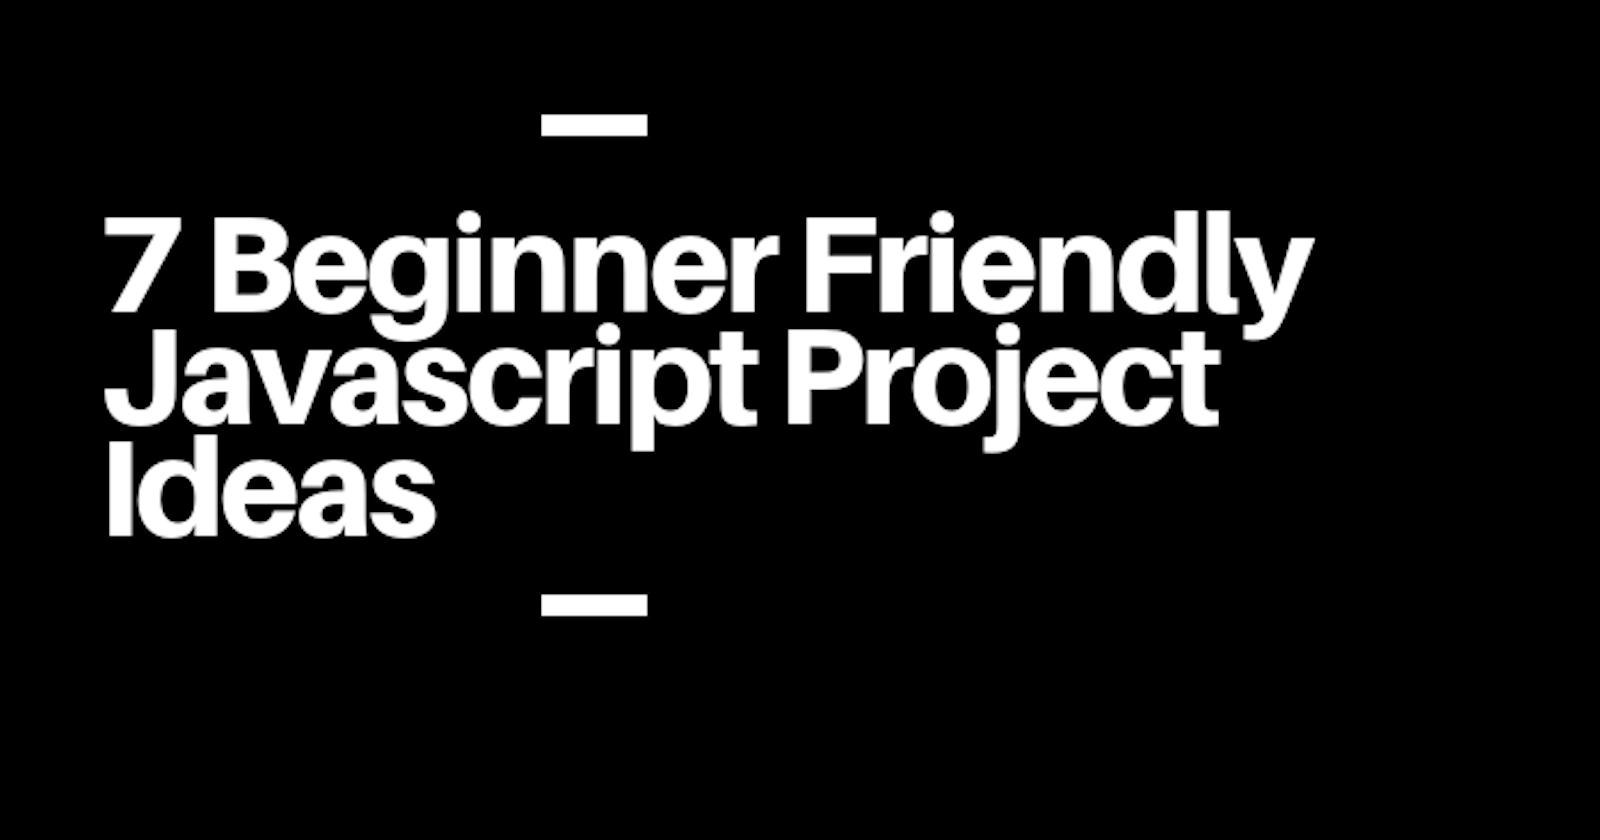 7 Beginner Friendly Javascript Project Ideas